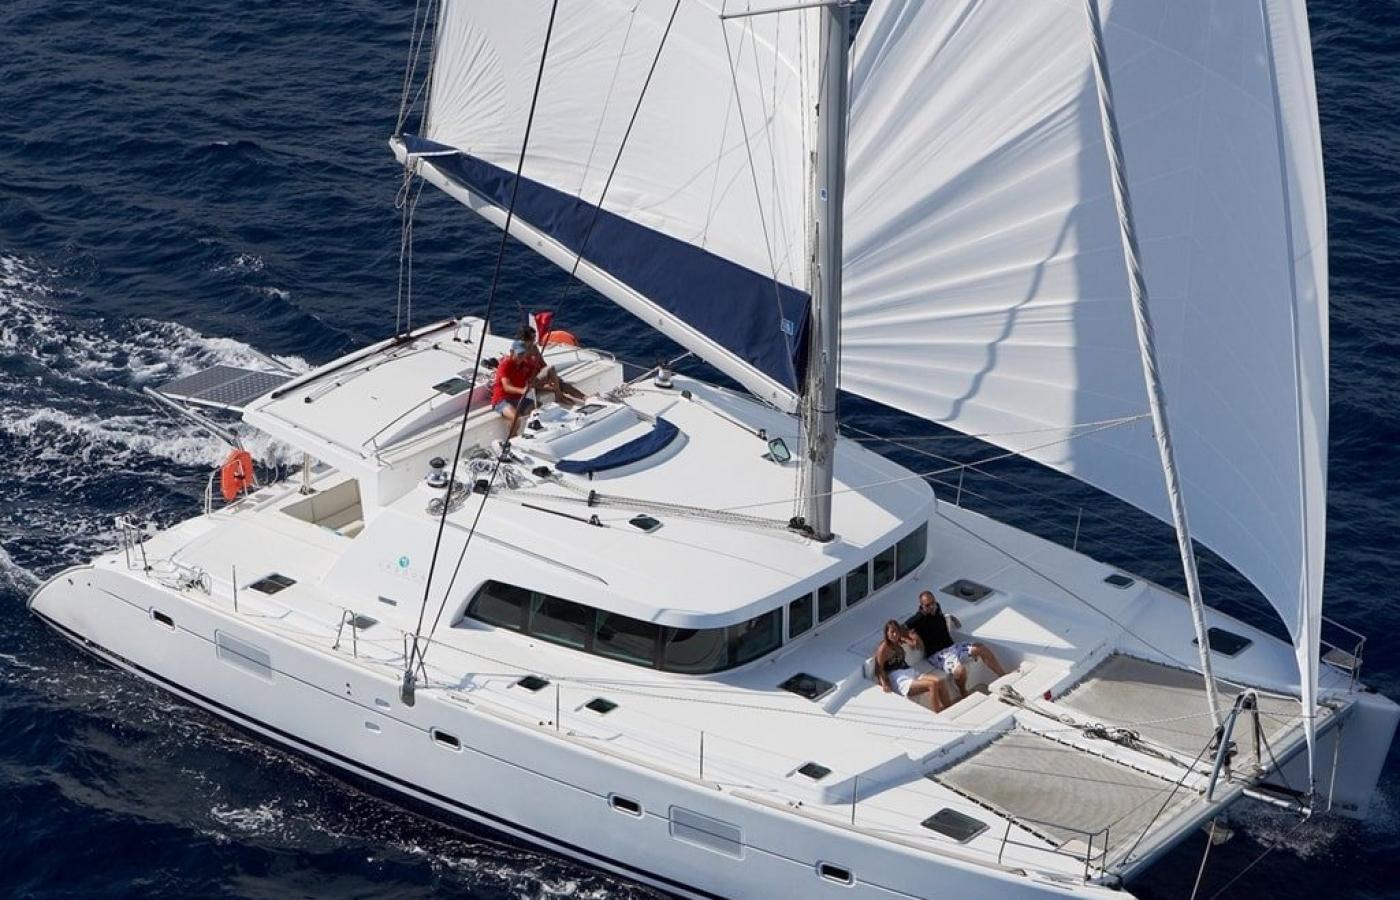 Set sail on the Lagoon 50 Italy cat from Salerno - Marina d'Arechi